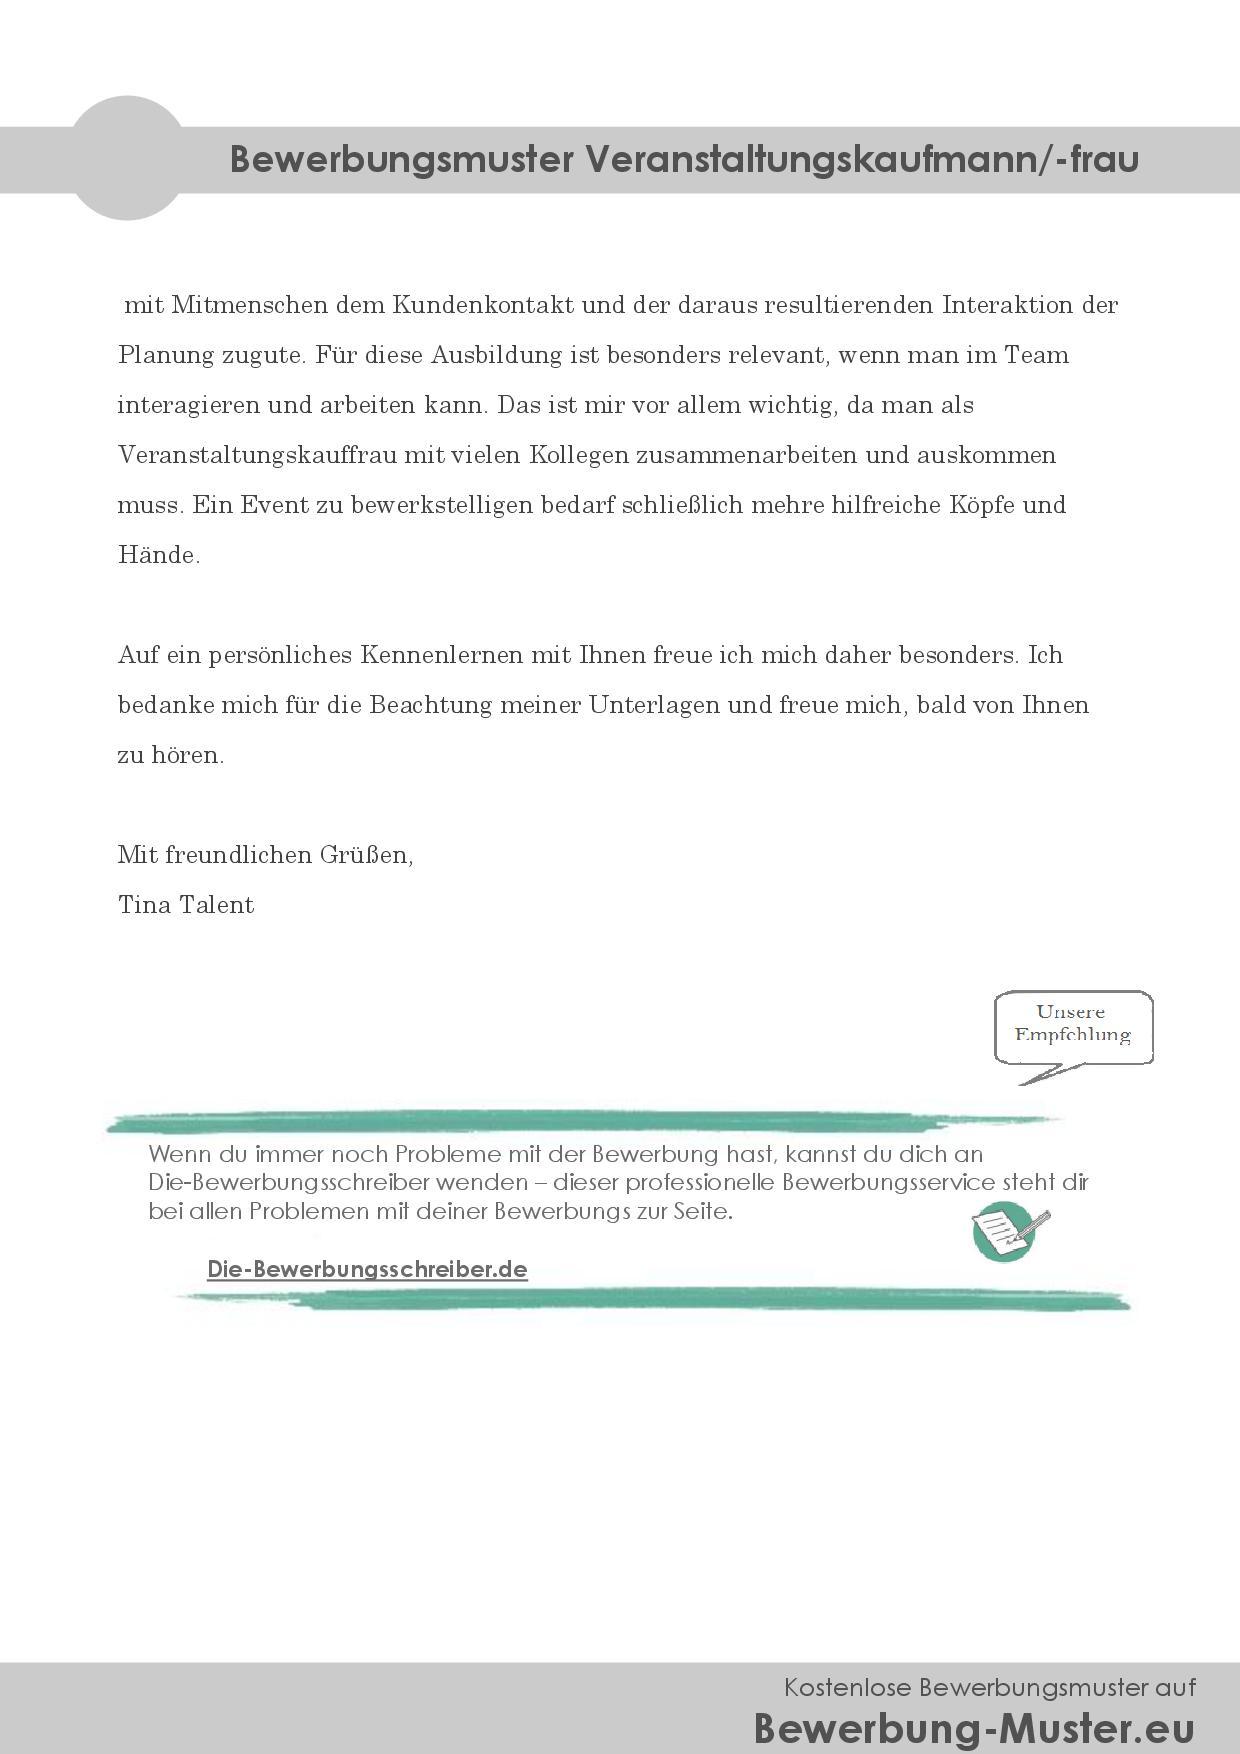 Bewerbungsmuster Veranstaltungskaufmann/-frau